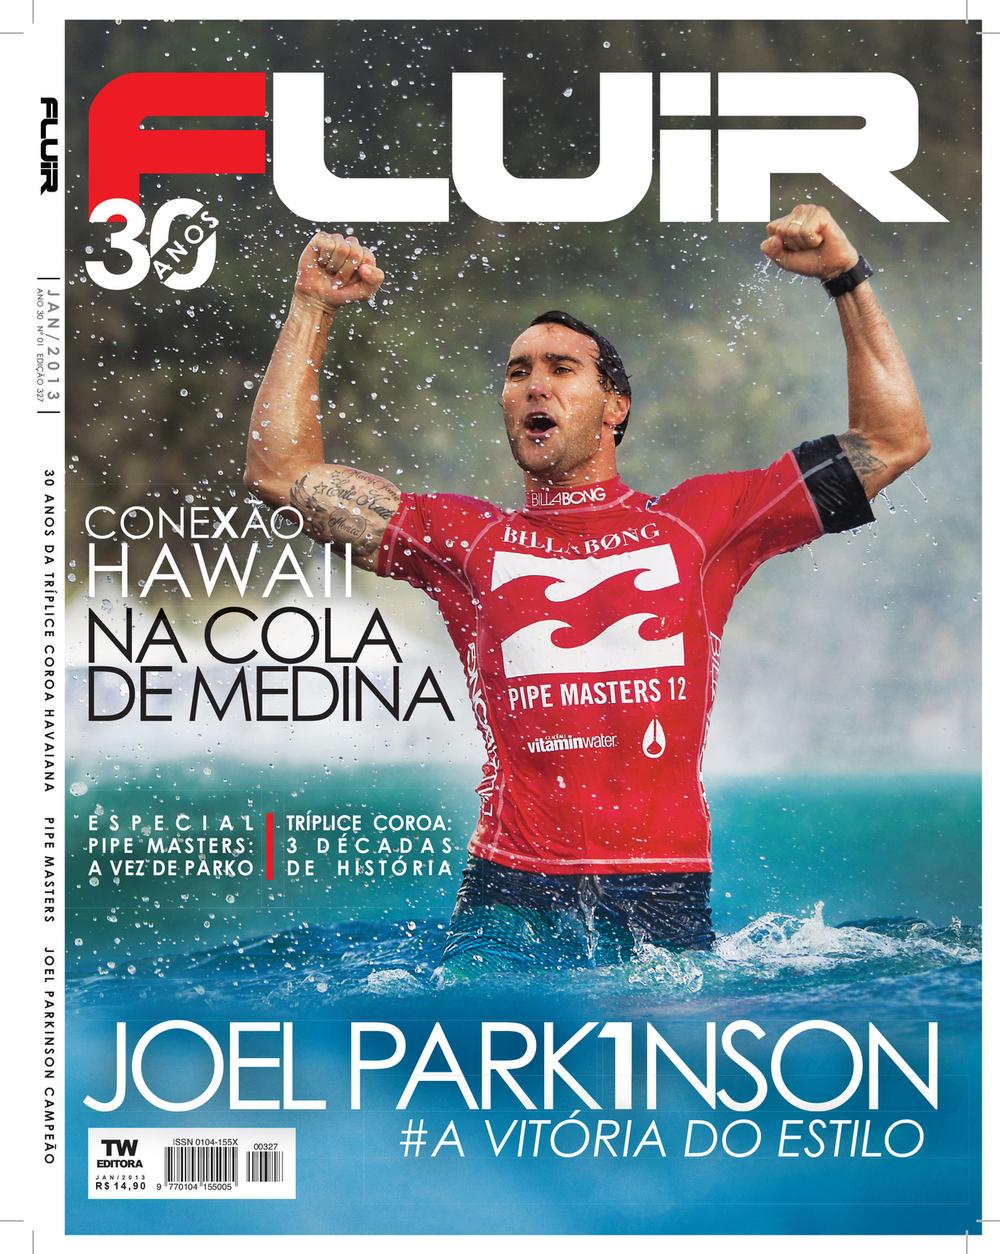 covers025.JPG